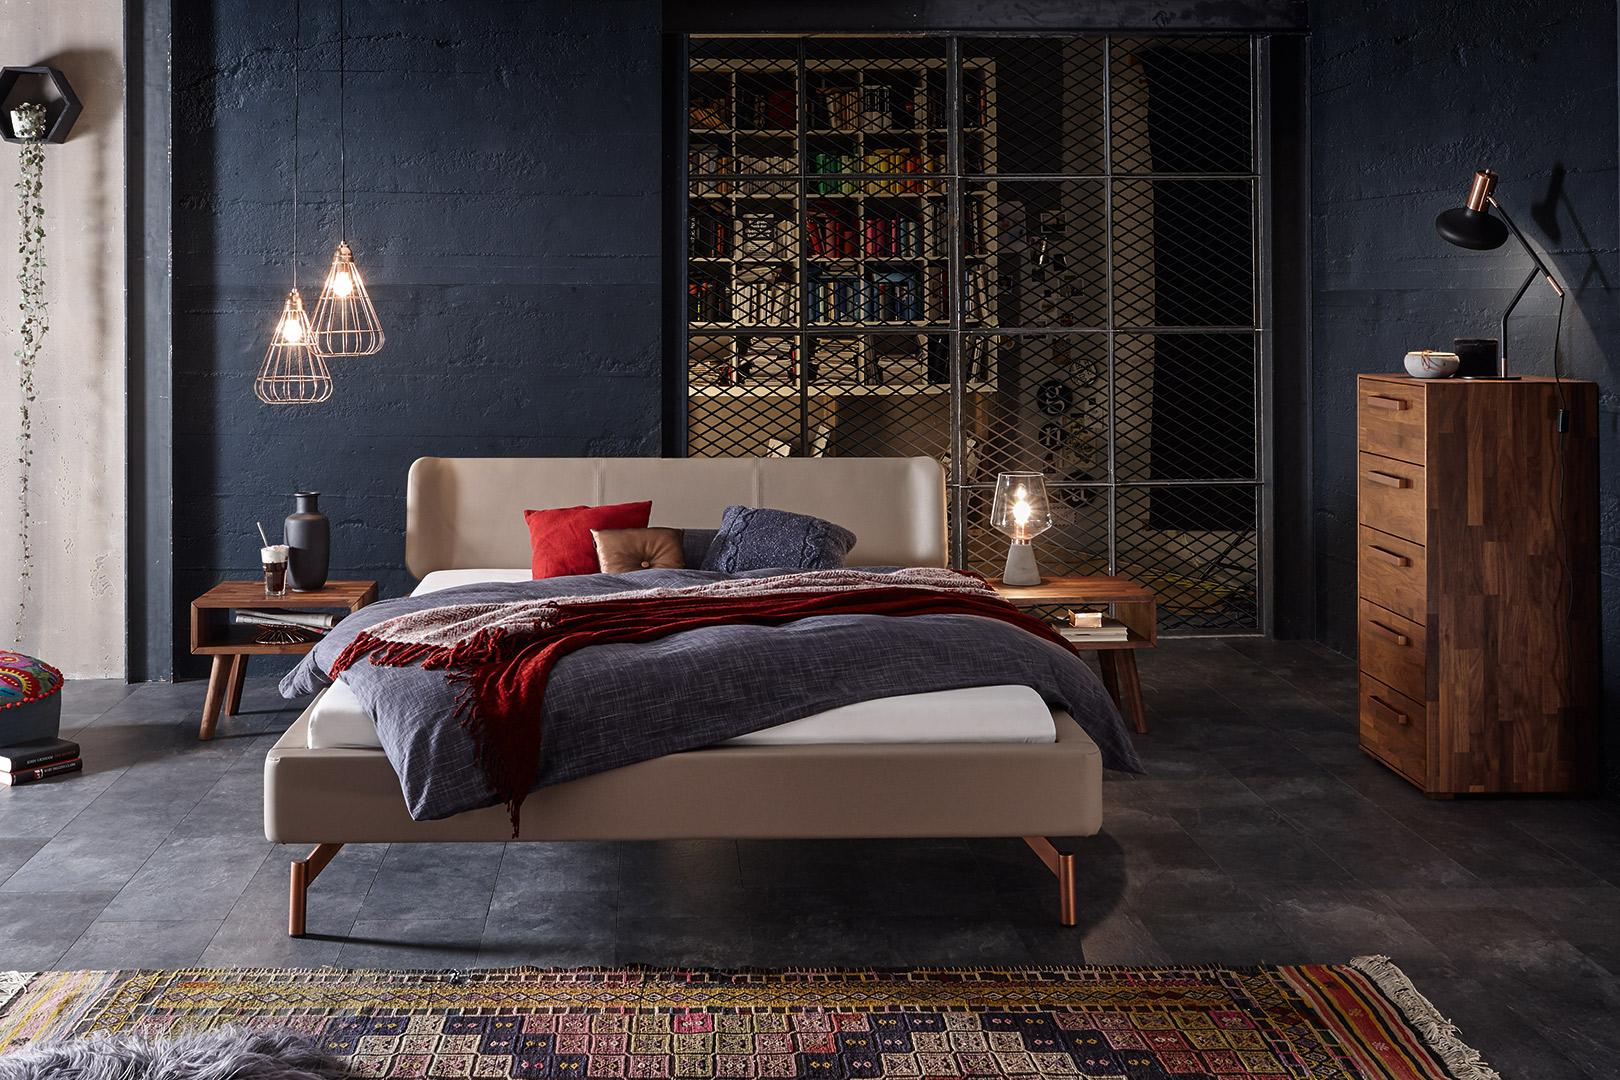 modernes Polsterbett mit Bettkonfigurator bei Sitec designen